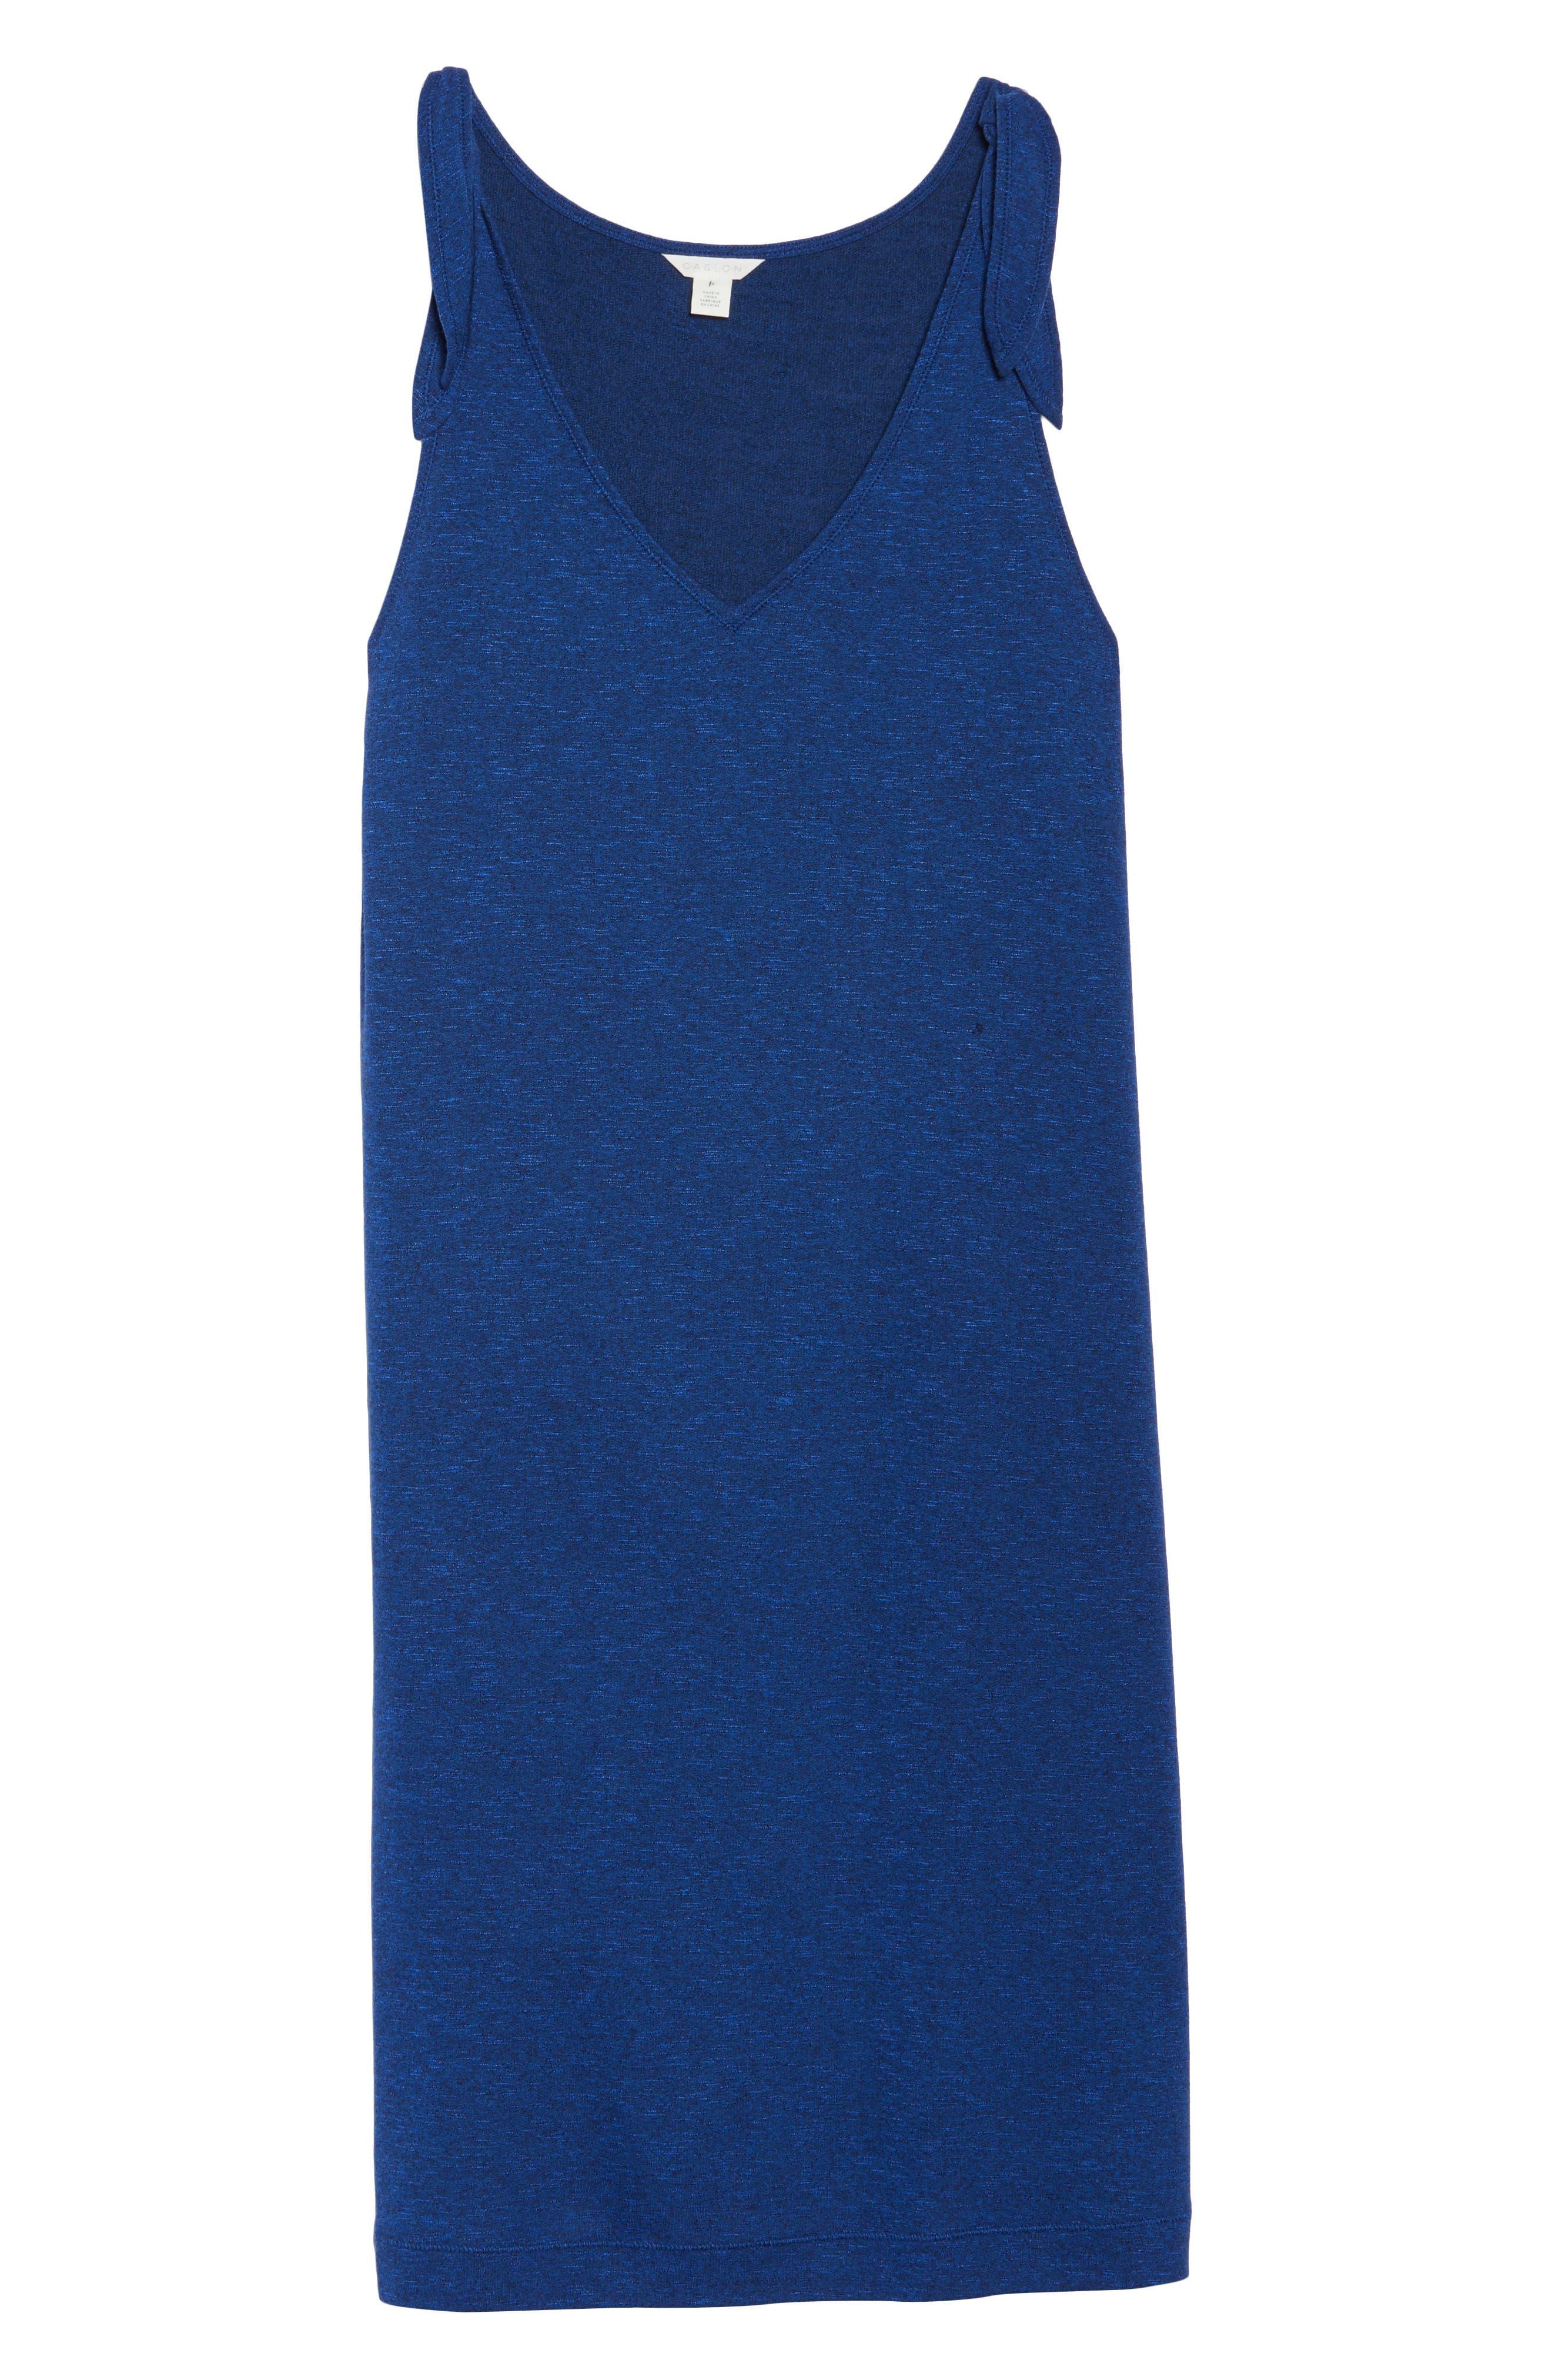 Knot Strap Knit Swing Dress,                             Alternate thumbnail 7, color,                             Cobalt Blue Slub Terry